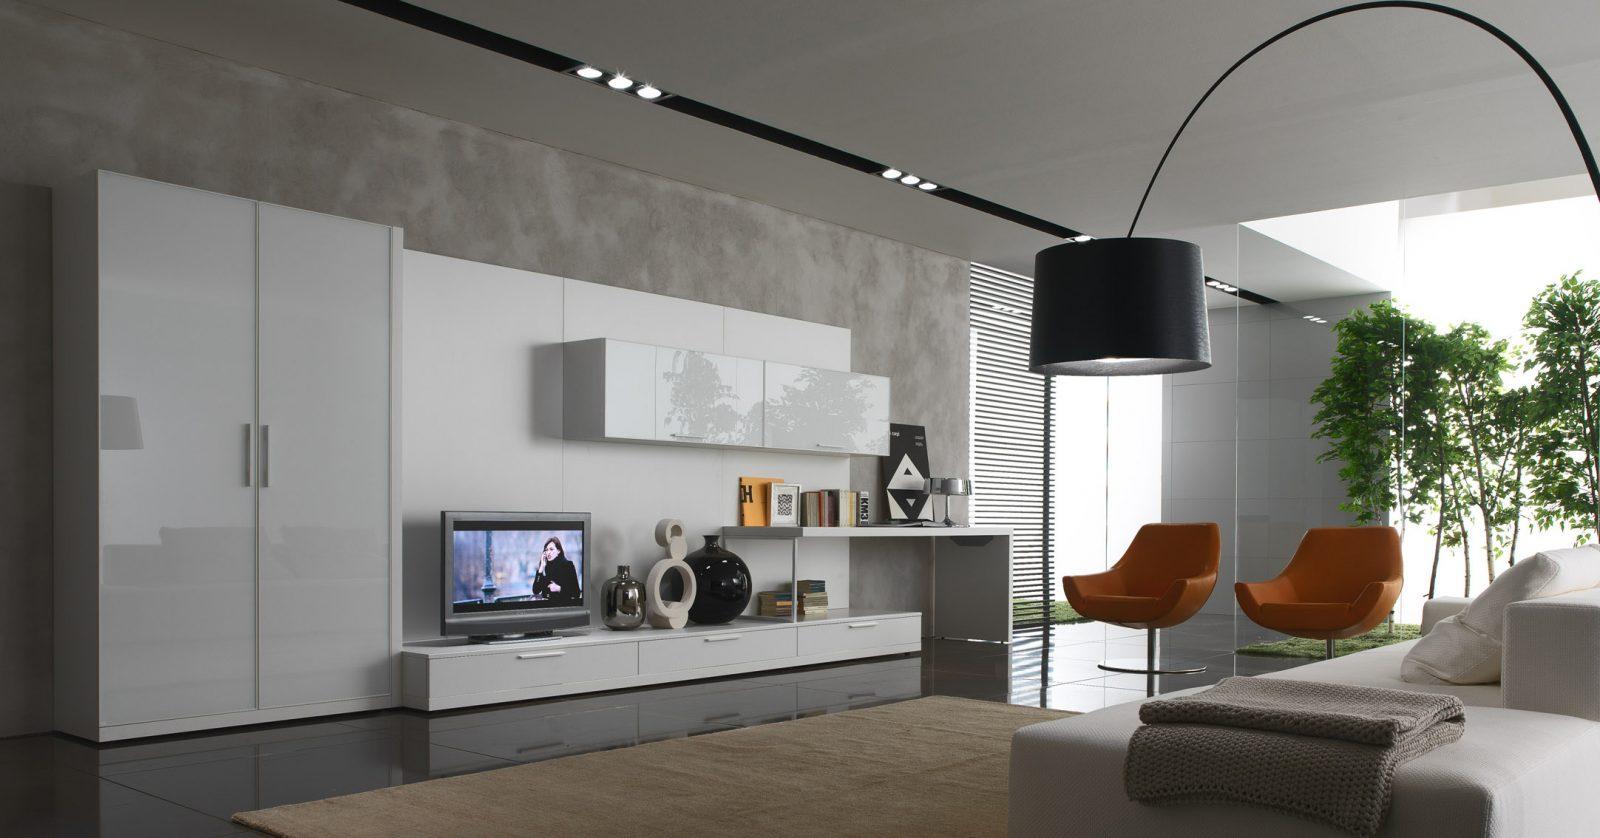 Si vas a reformar tu hogar, aprovecha para redecorarlo.jpg